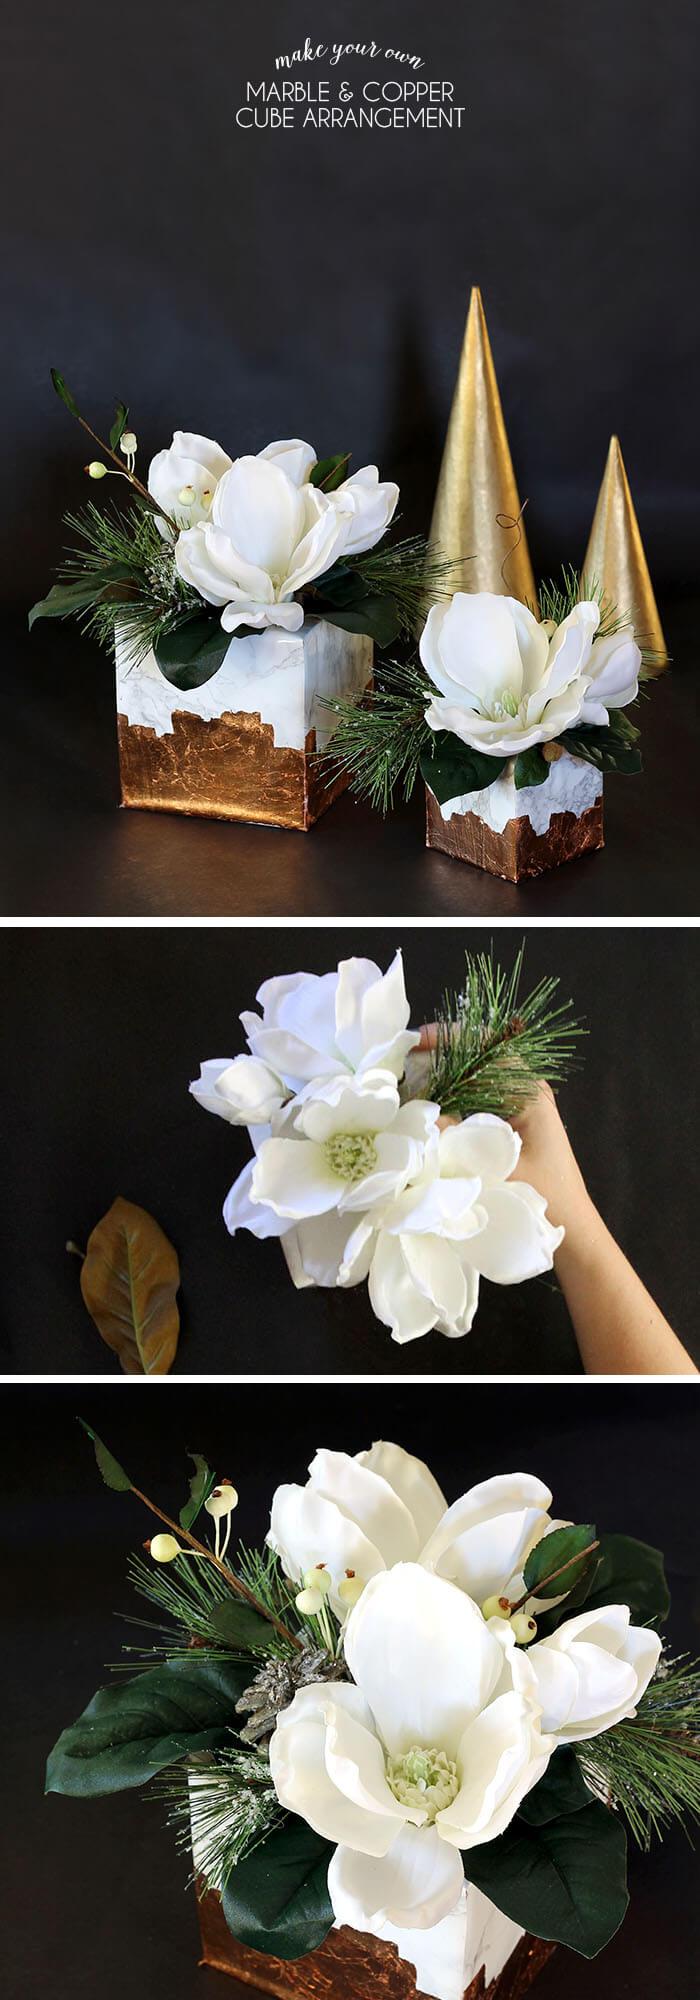 marble copper cube winter floral arrangement persia lou. Black Bedroom Furniture Sets. Home Design Ideas